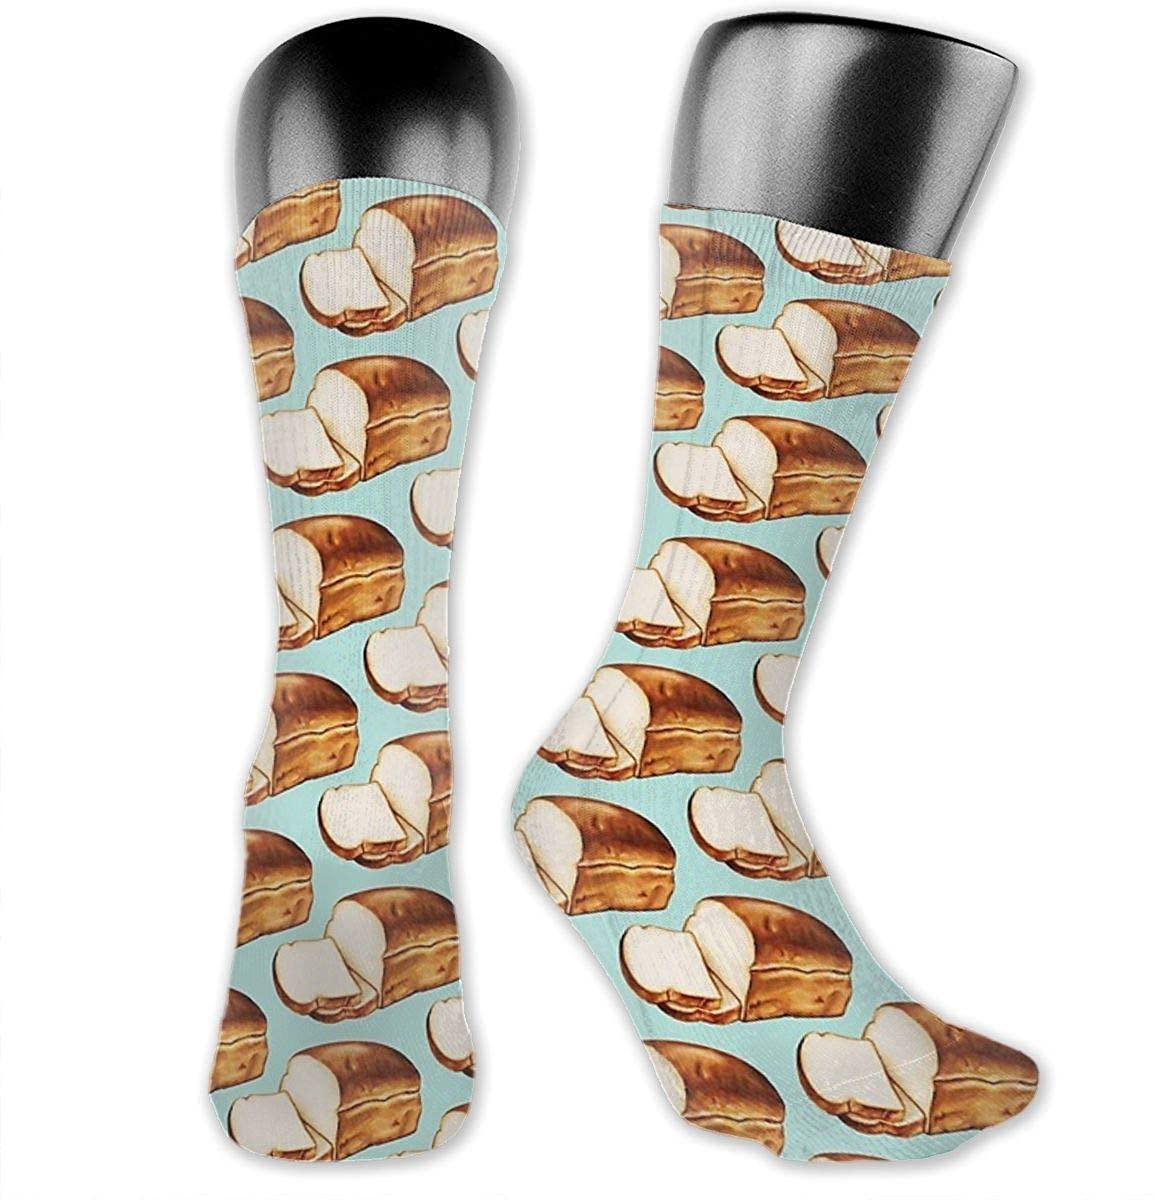 Unisex Crazy Funny Cool 3D Print Bread Pattern Socks Colorful Athletic Medica Socks Novelty Casual Crew Socks